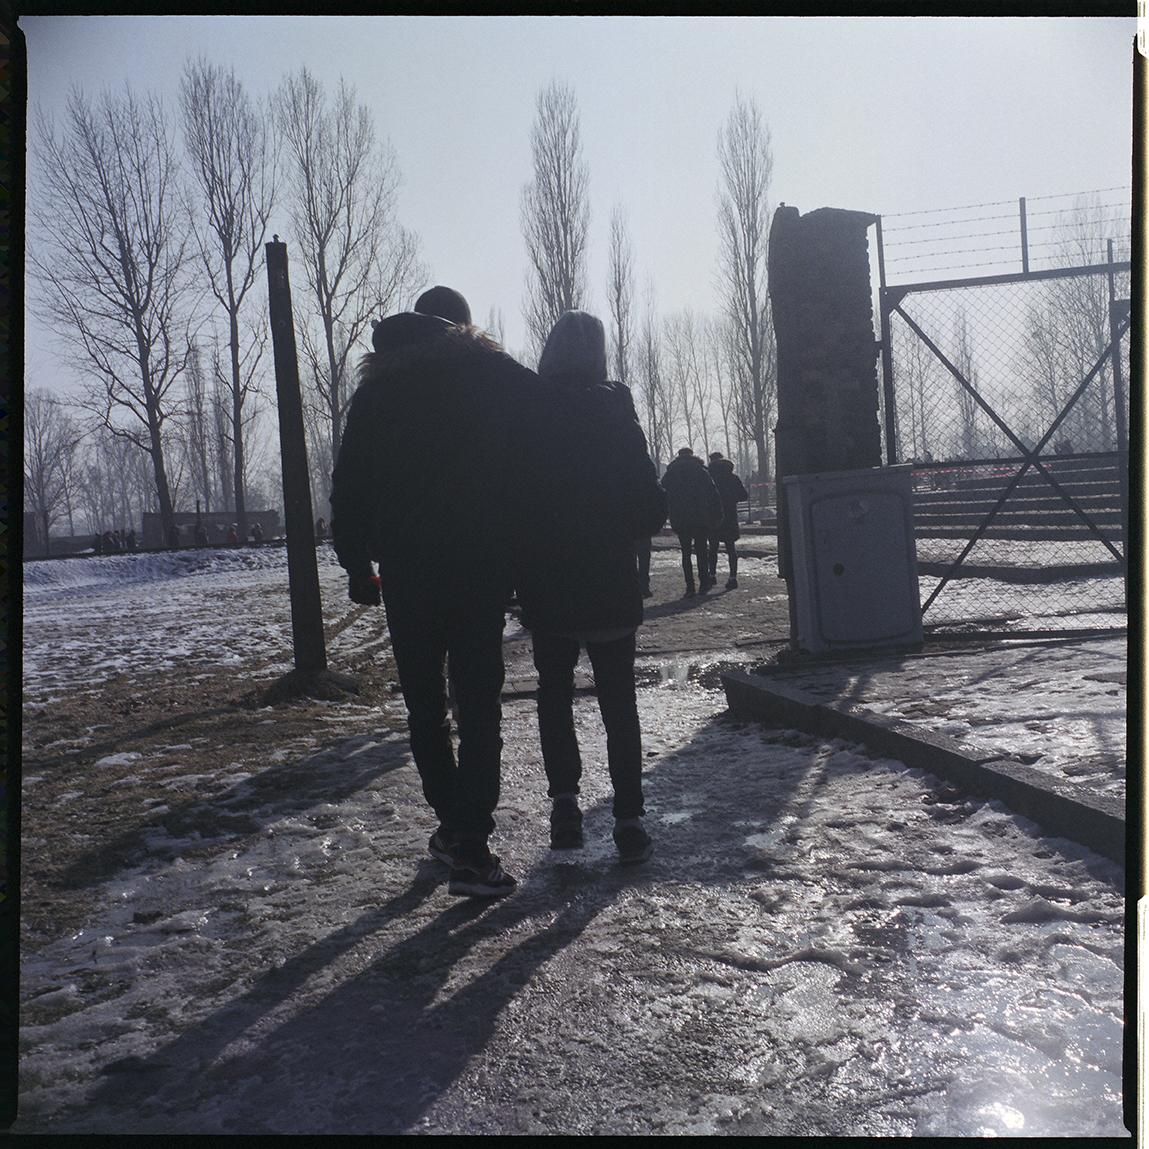 3_oswiecim_deux garçons_site